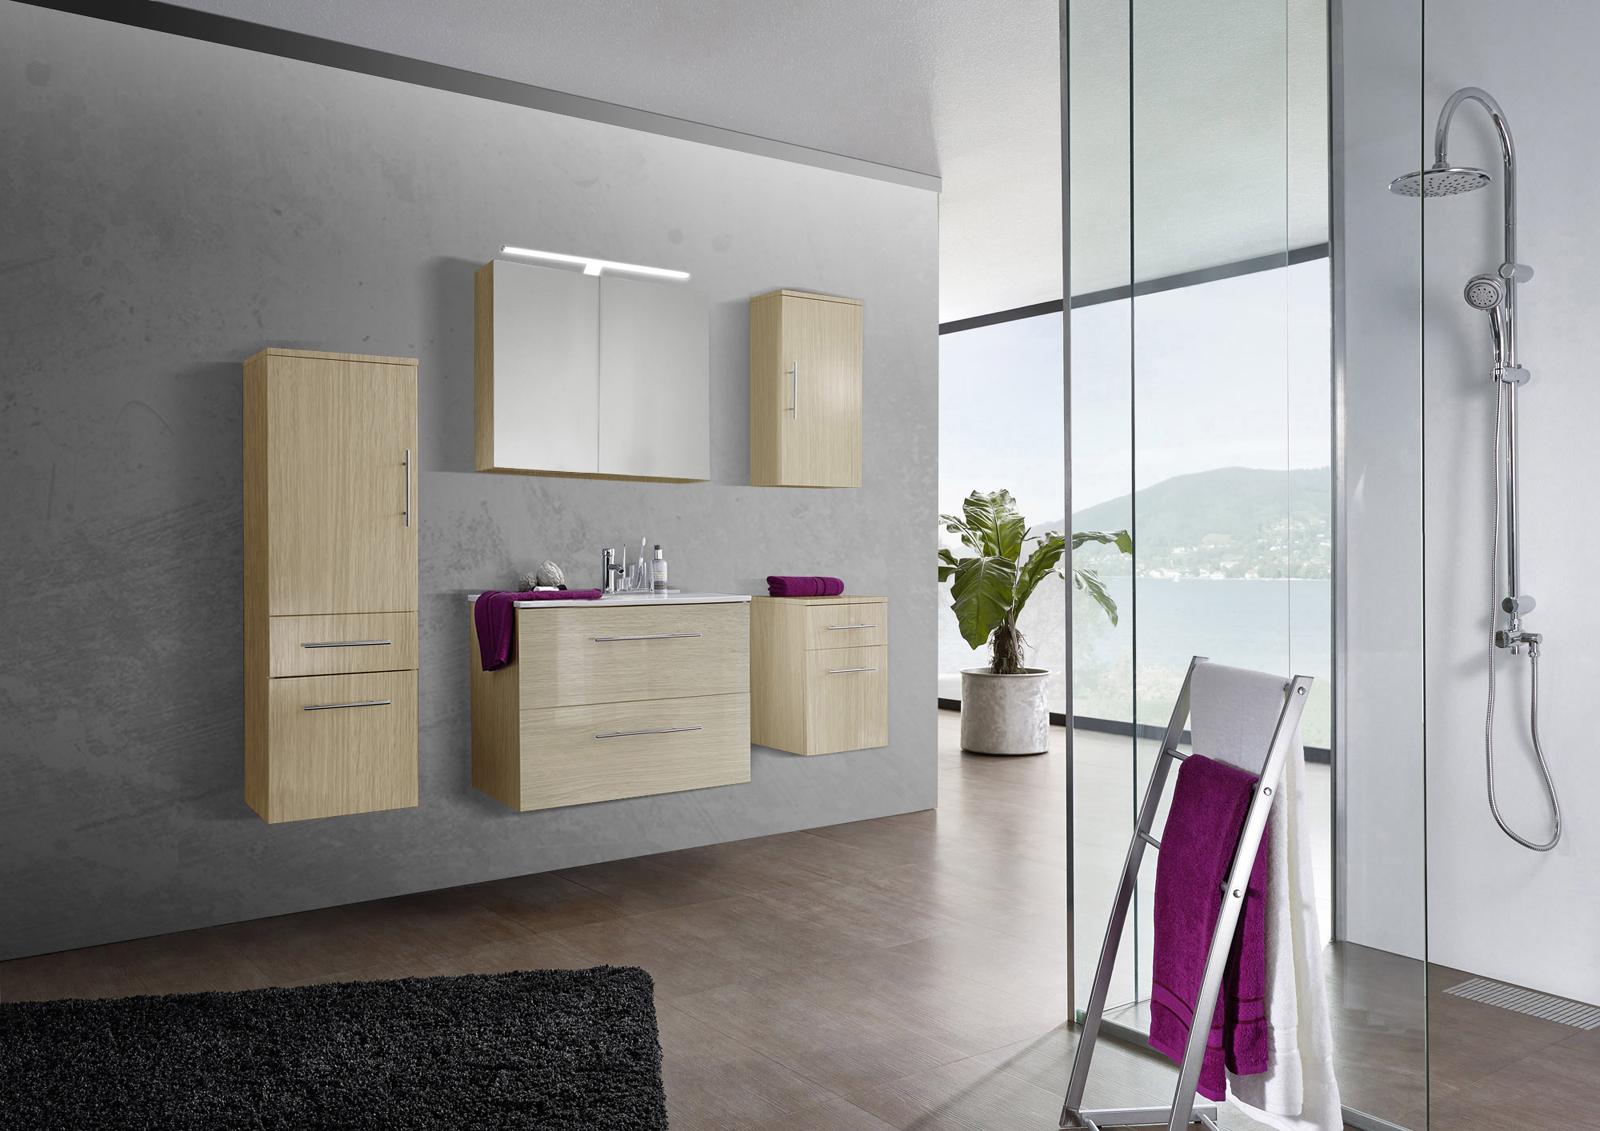 Sam 5tlg badezimmer set sonomaeiche 80 cm verena demn chst - Badezimmer set ...